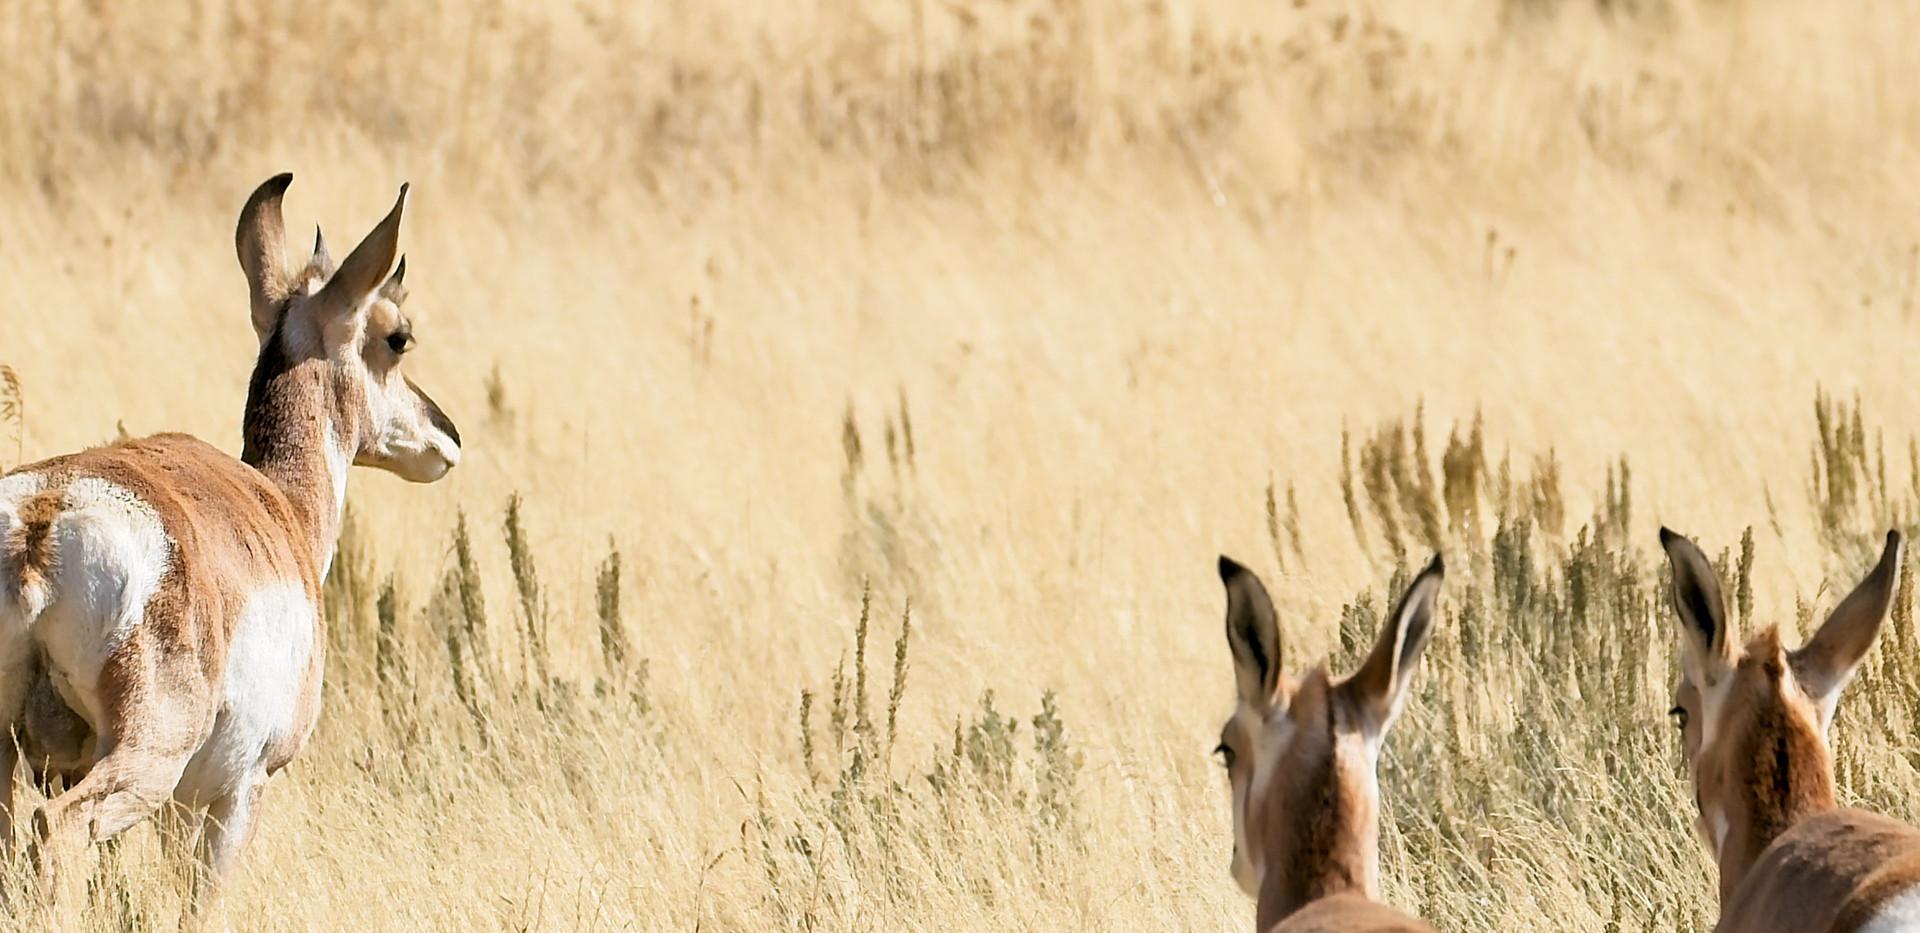 Three Antelope